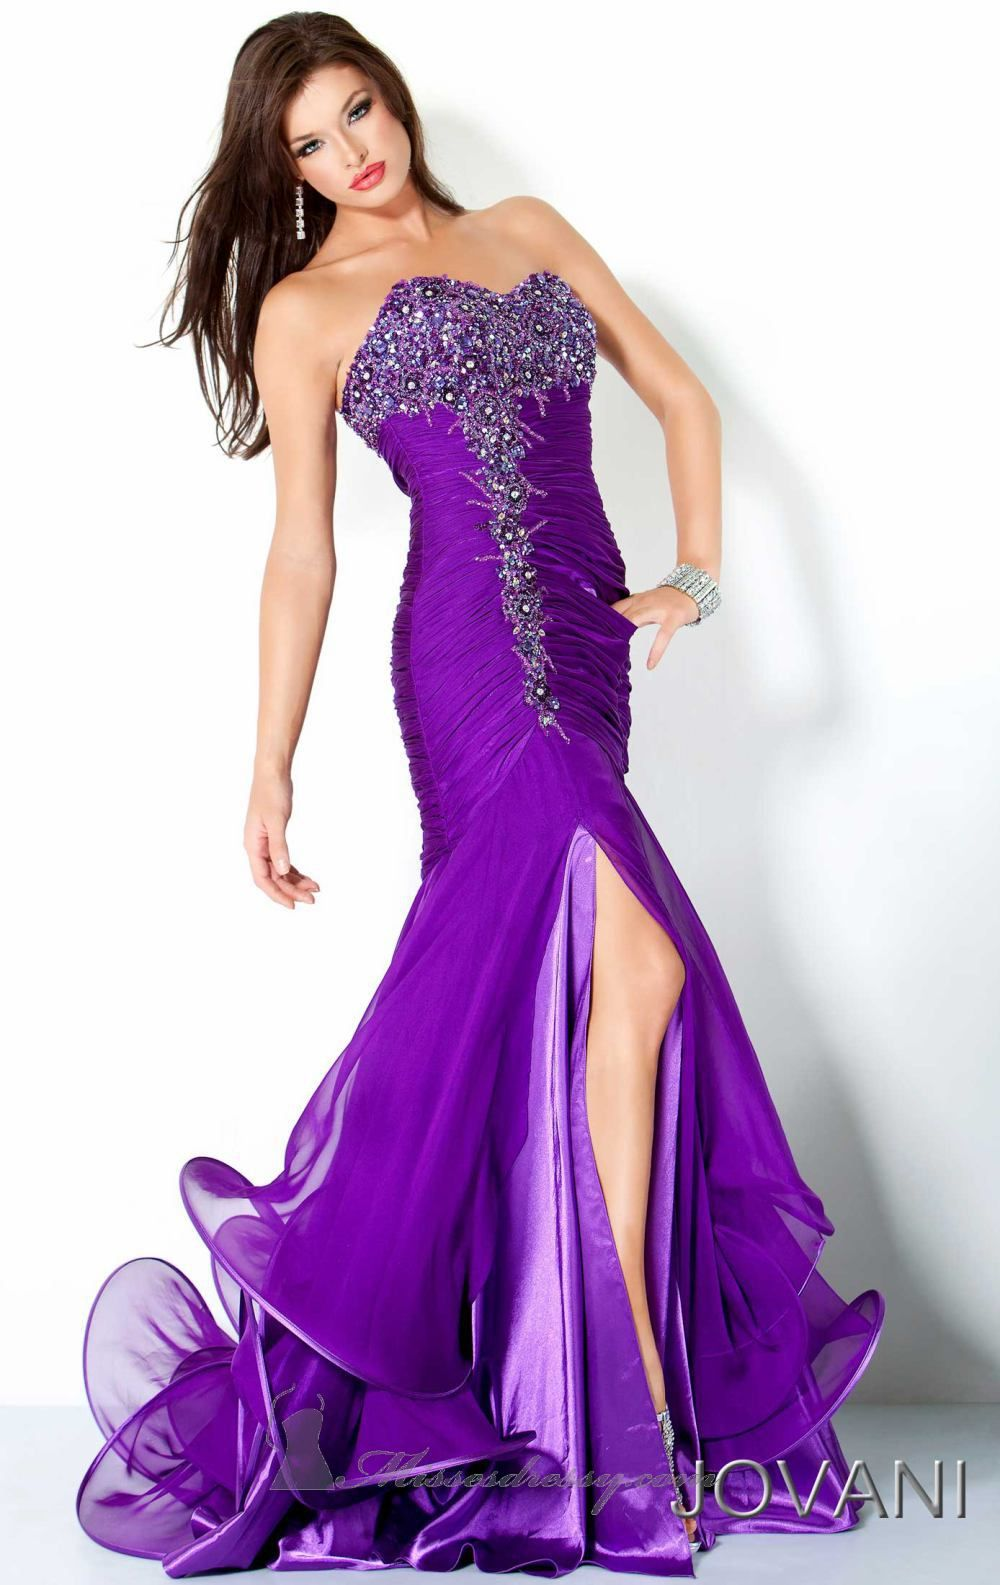 Jovani 3100 Dress - Available at www.missesdressy.com   Evening ...